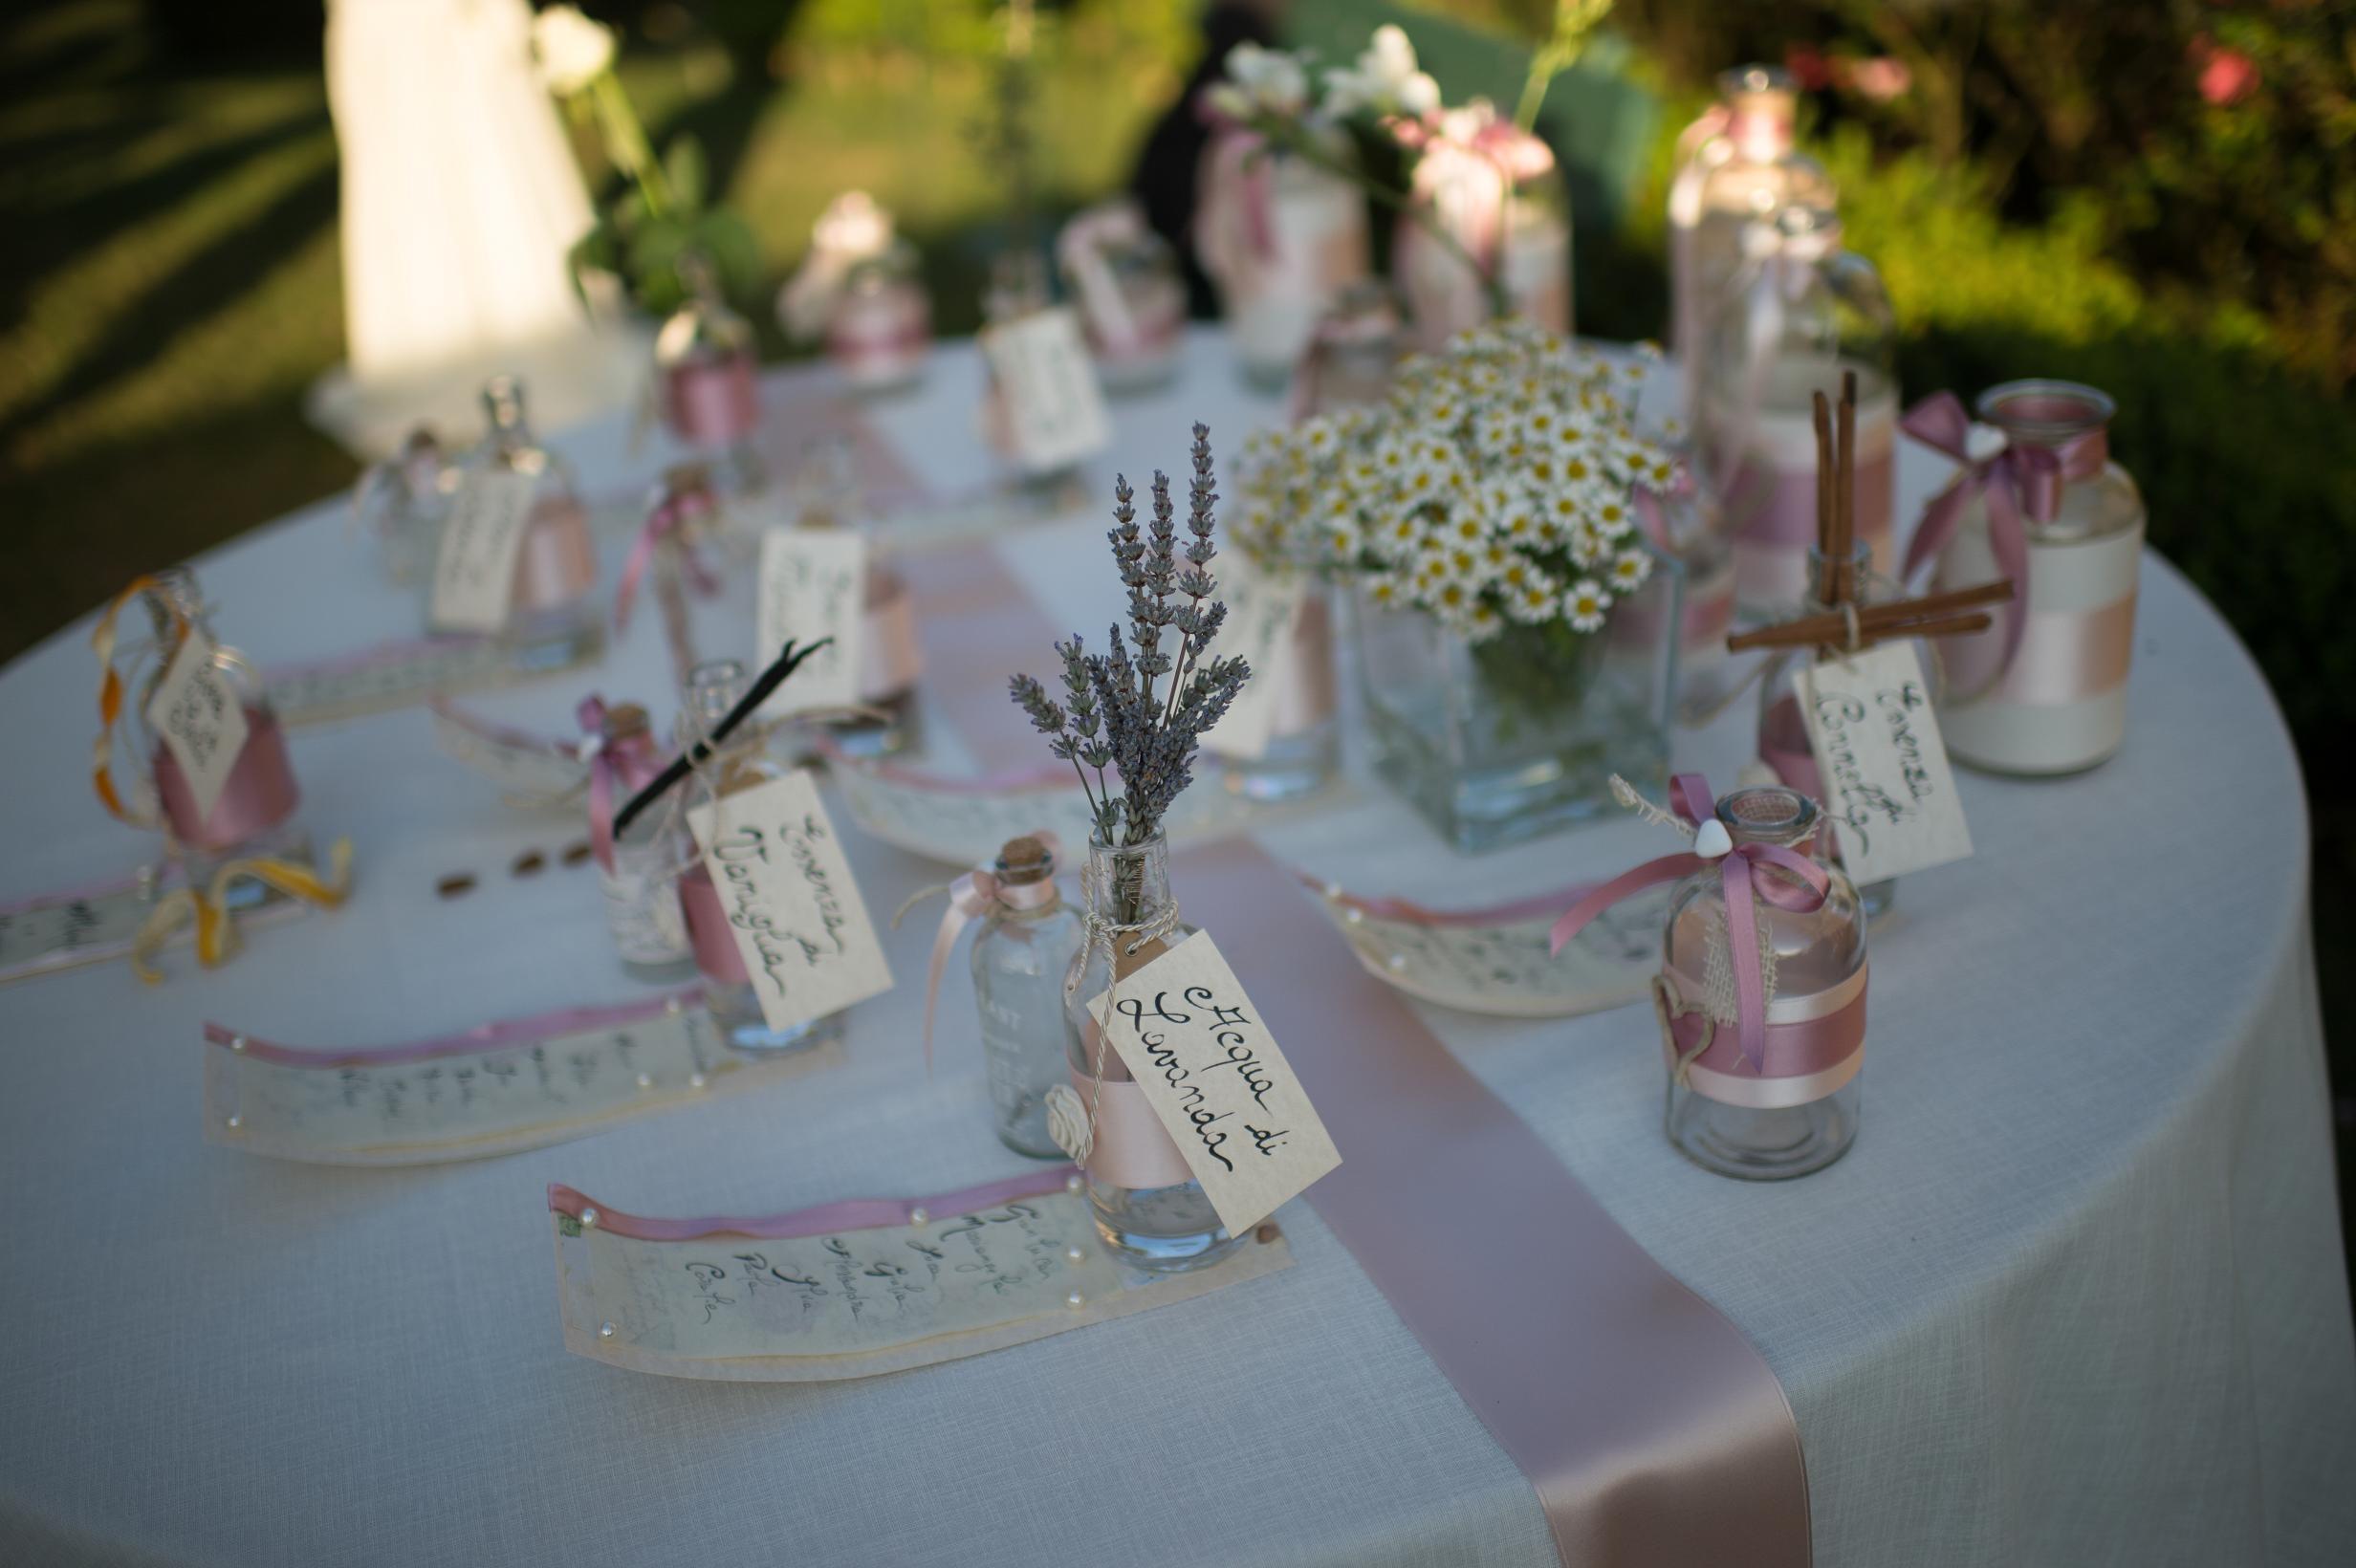 Matrimonio Tema Elegante : Tableau de mariage essenze profumi